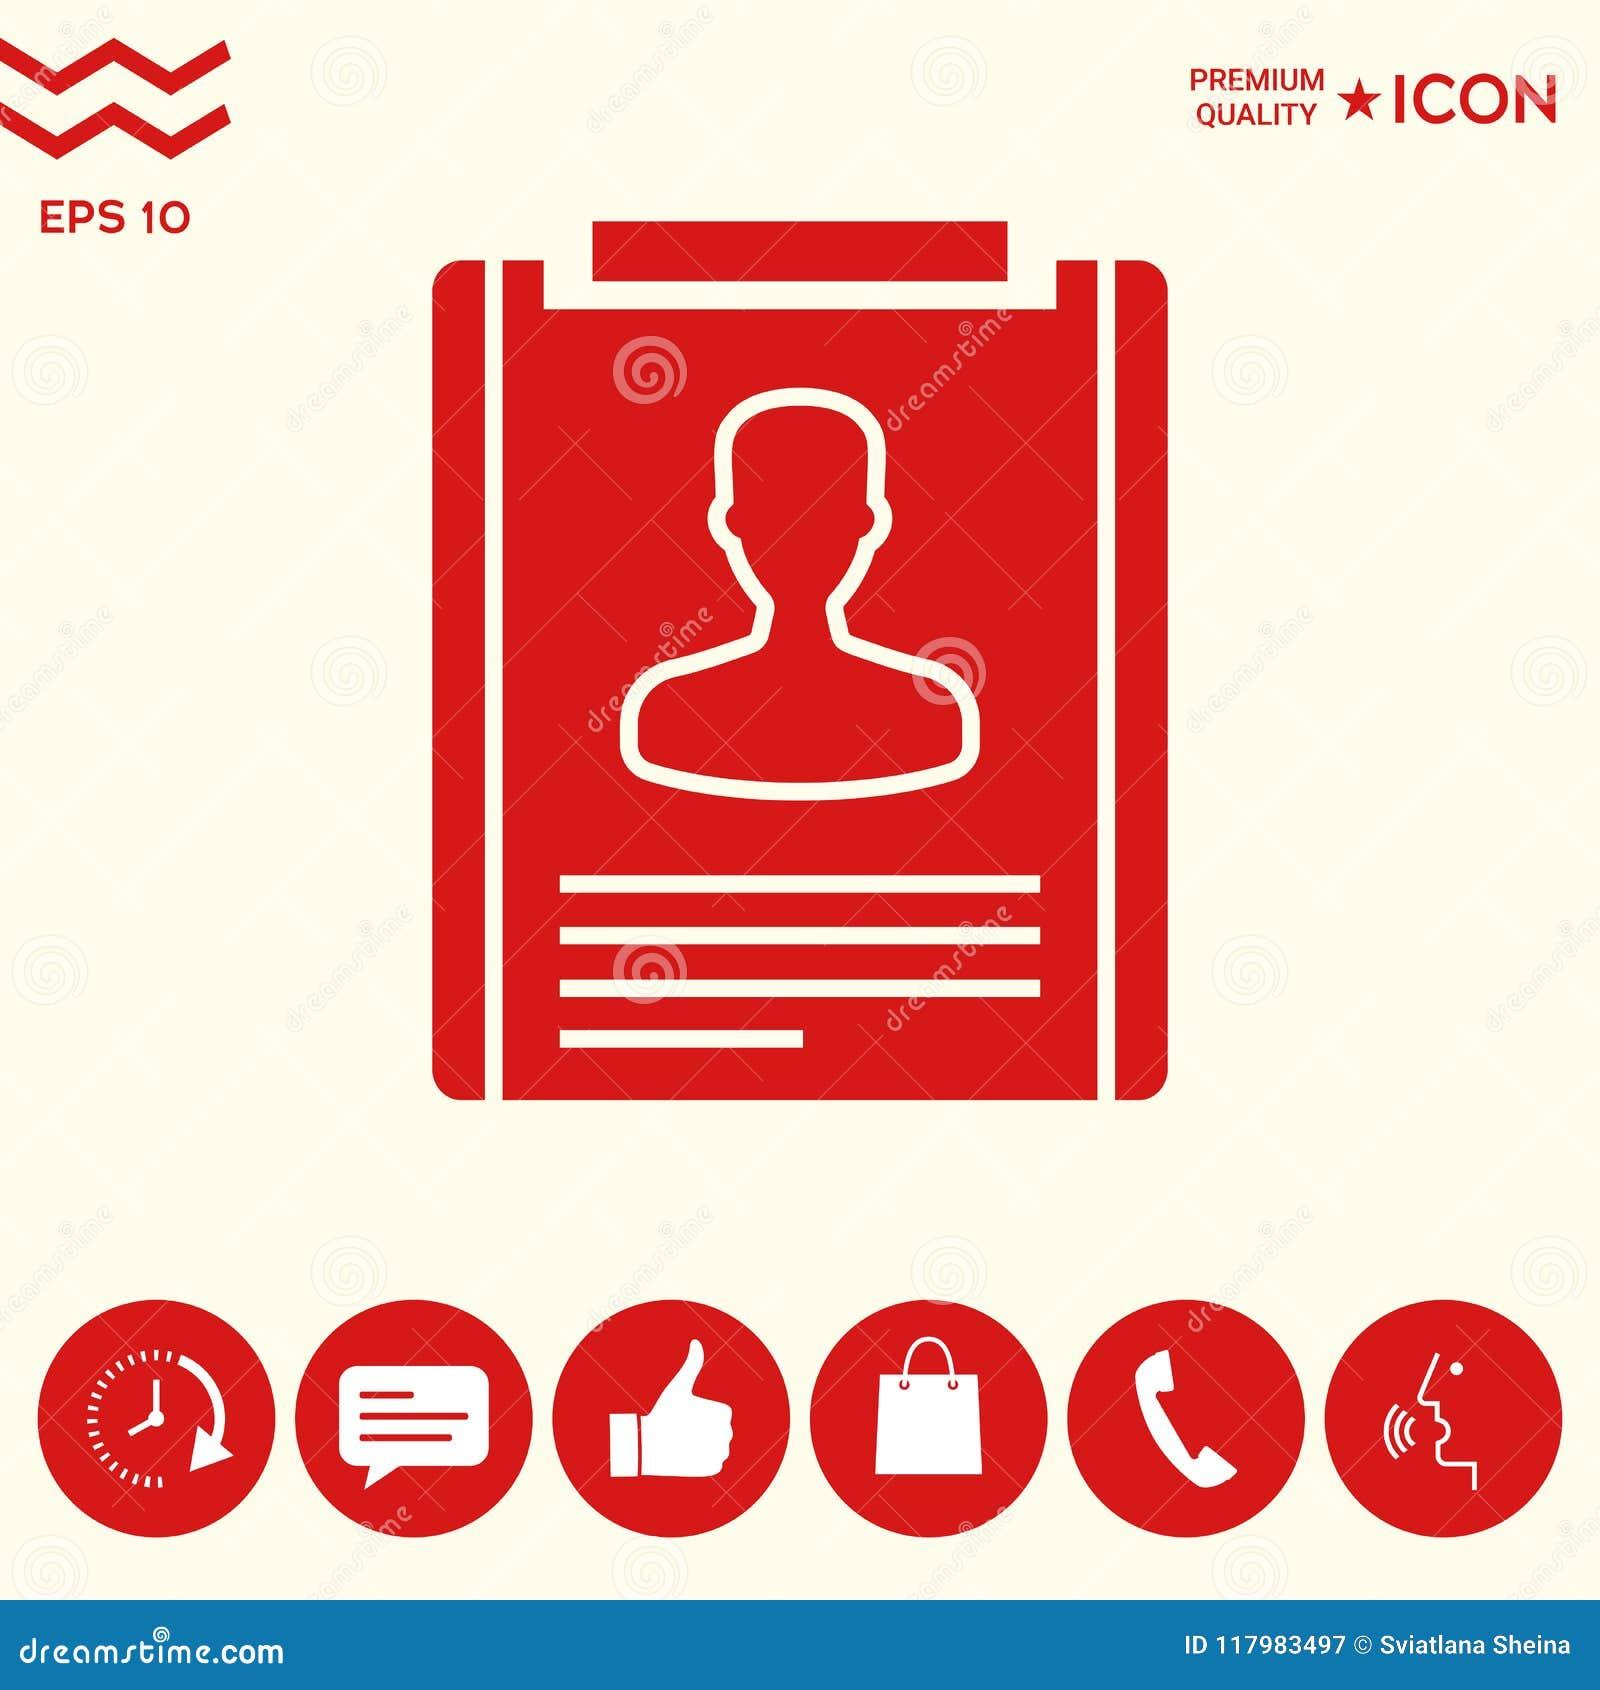 Resume icon symbol stock vector. Illustration of illustration ...